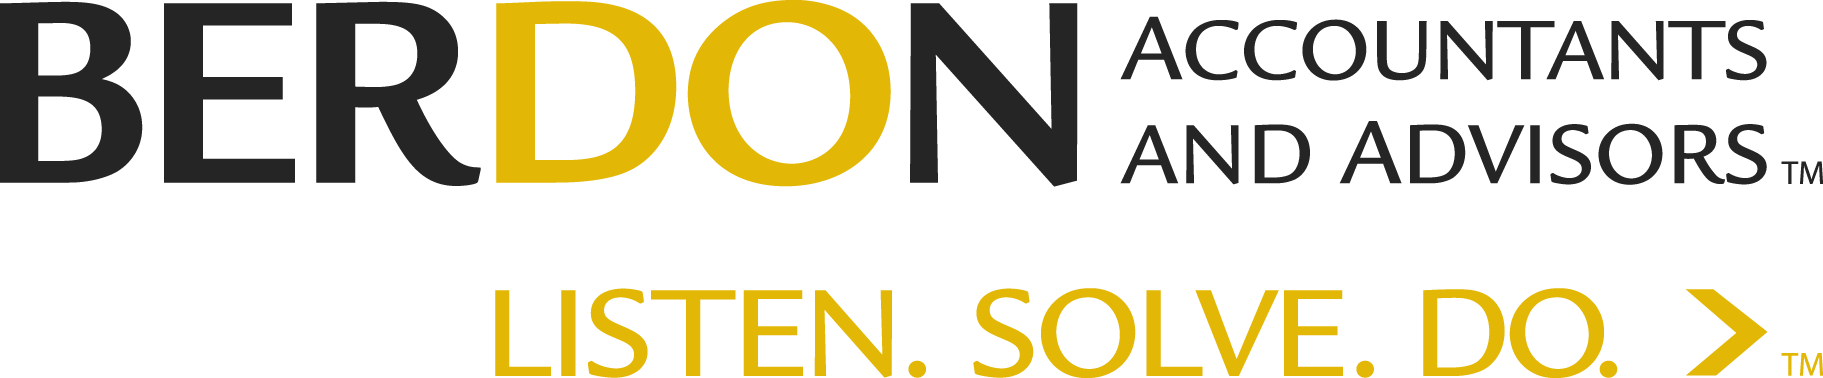 Berdon logo